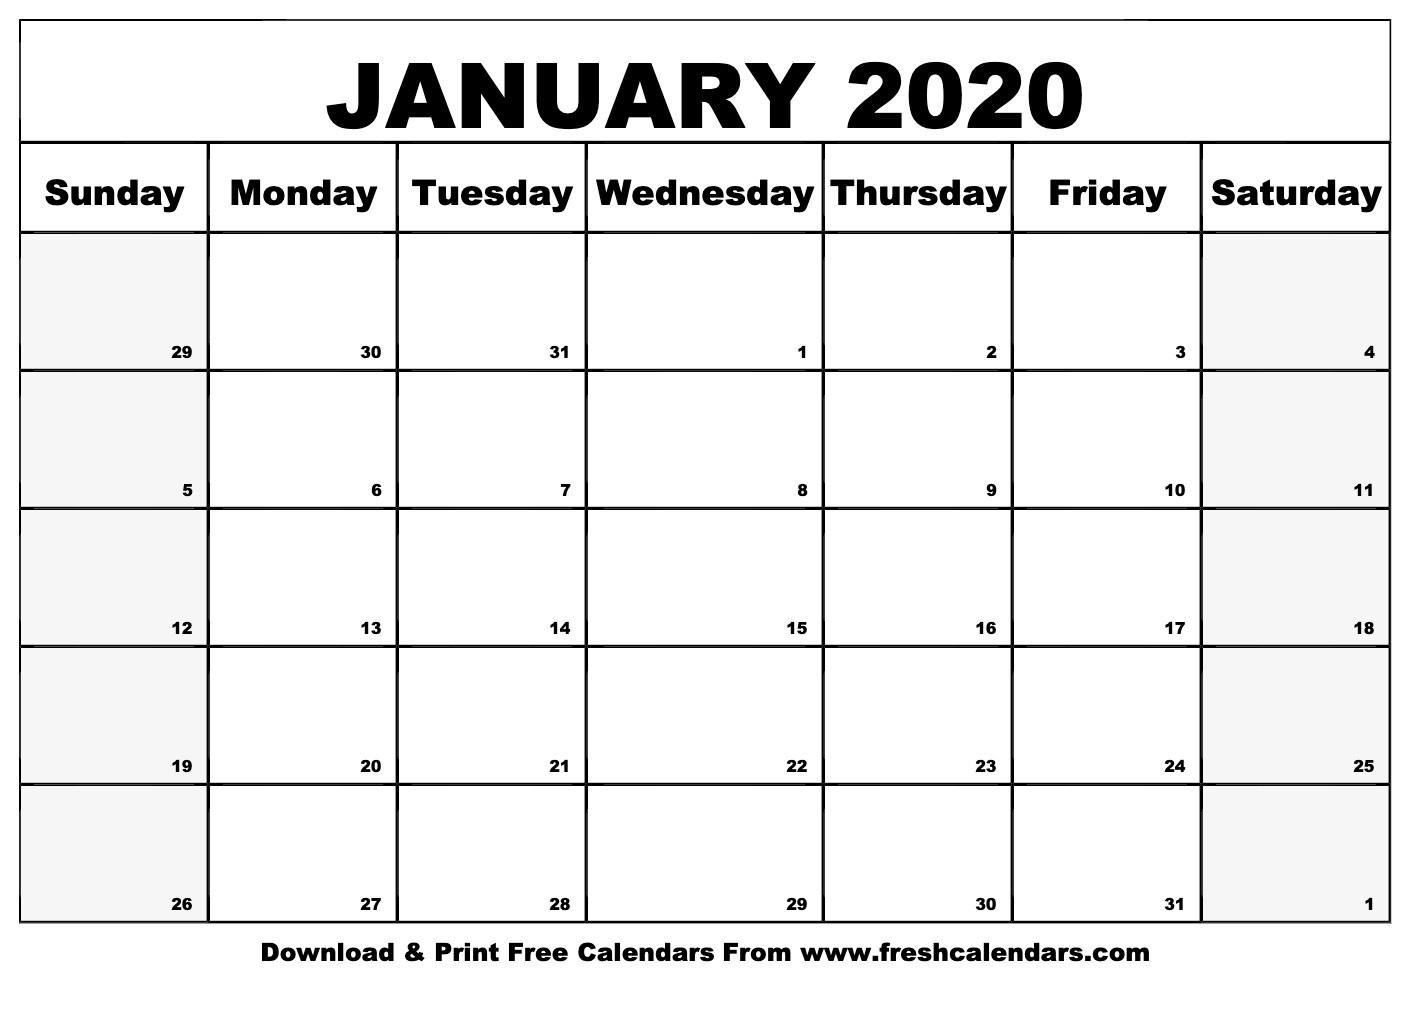 January 2020 Calendar Printable - Fresh Calendars-January 2020 Calendar In Excel